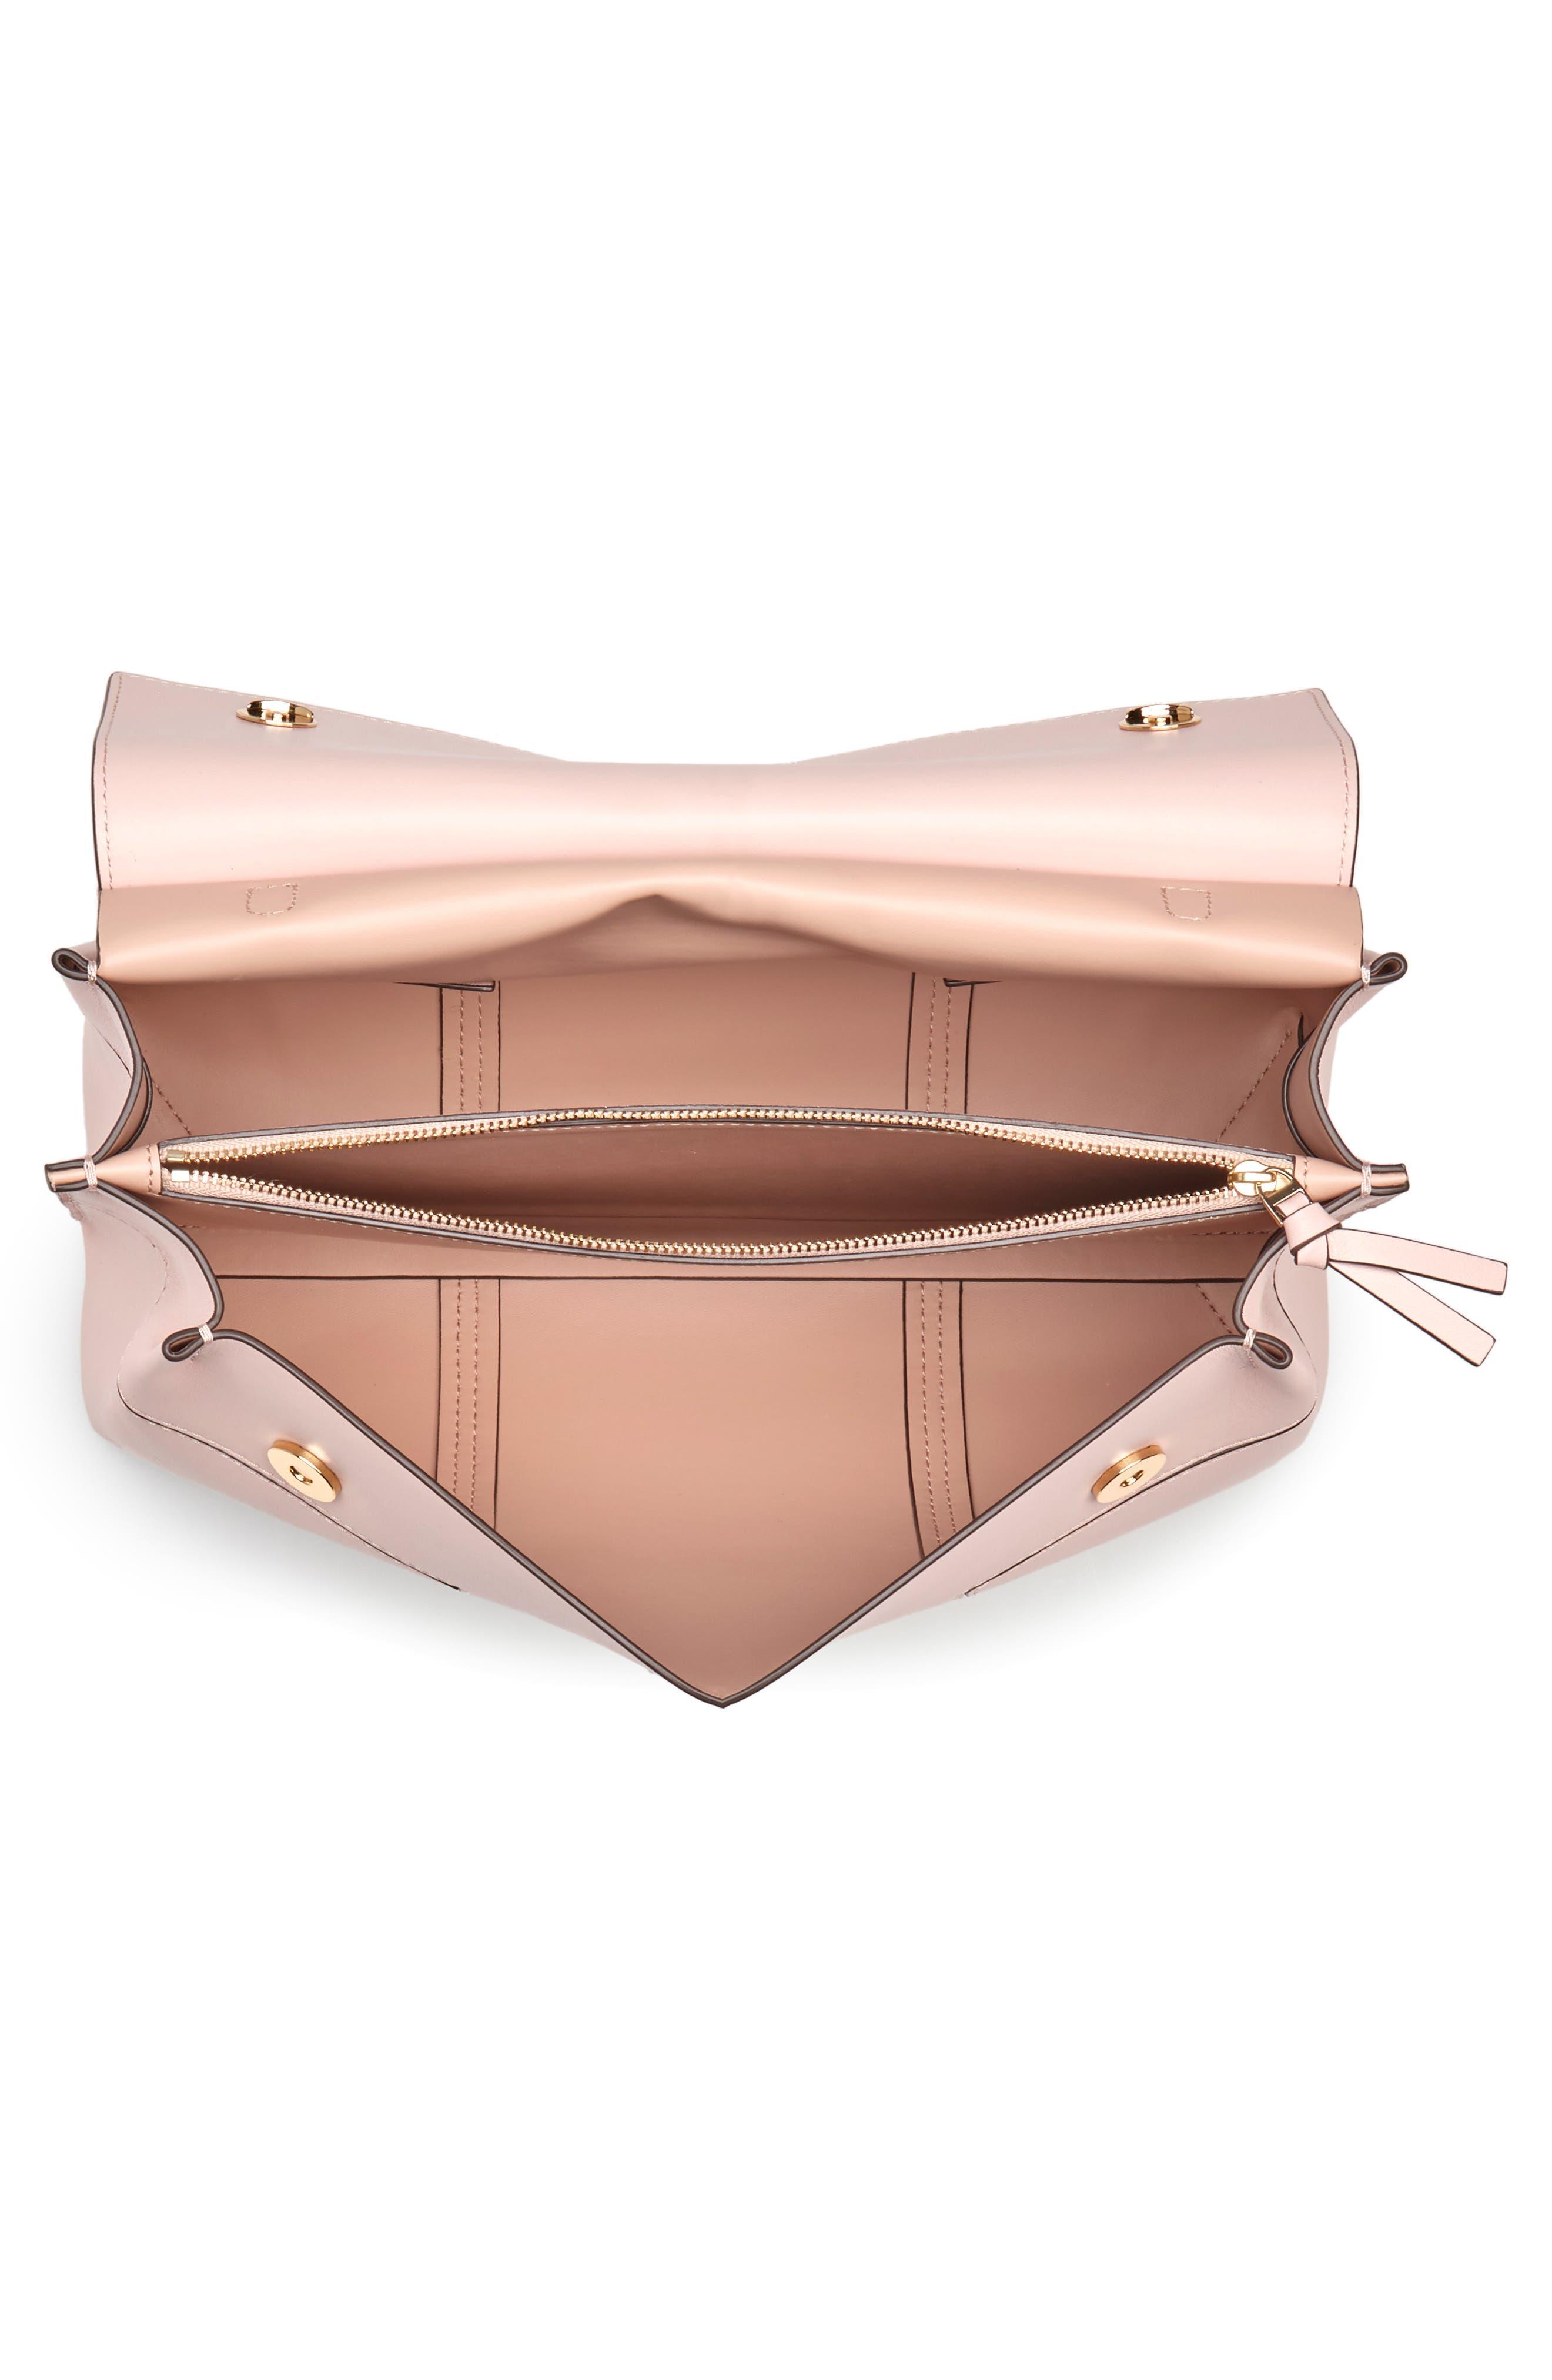 Block T Leather Top Handle Satchel,                             Alternate thumbnail 4, color,                             Shell Pink/ Goan Sand